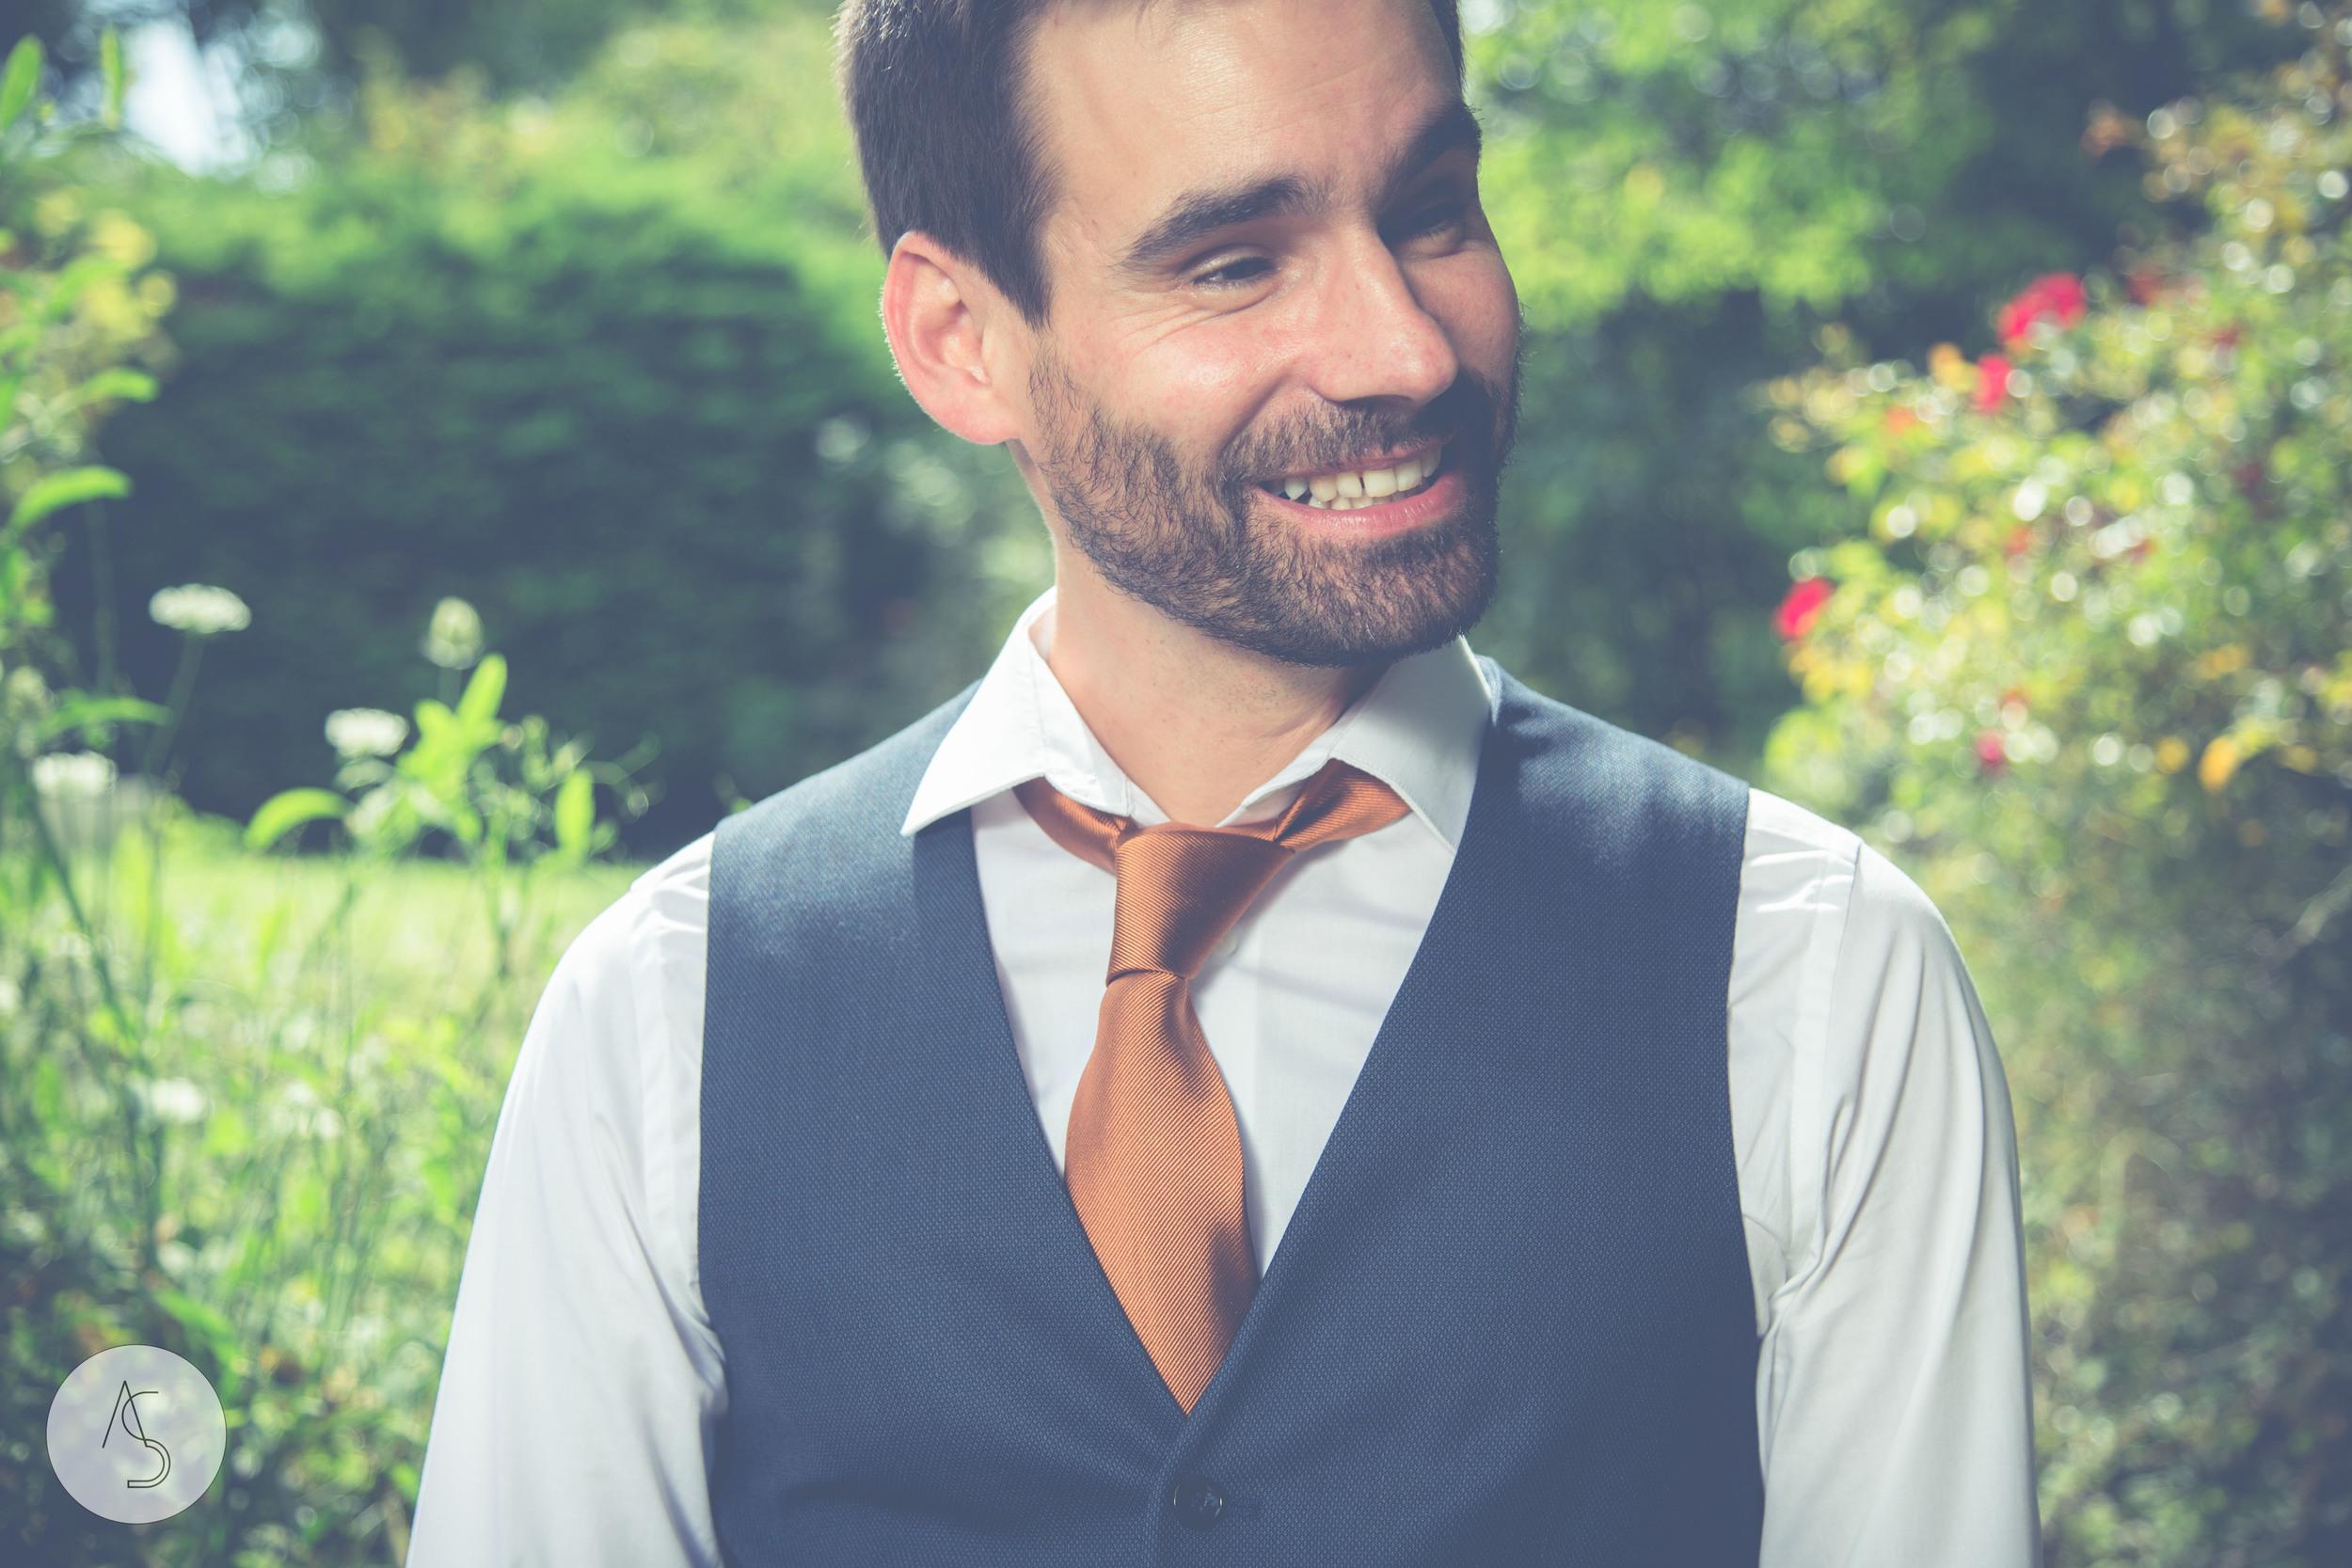 photographe mariage - Grenoble - Rhone Alpes - Adriana Salazar photo-52.jpg